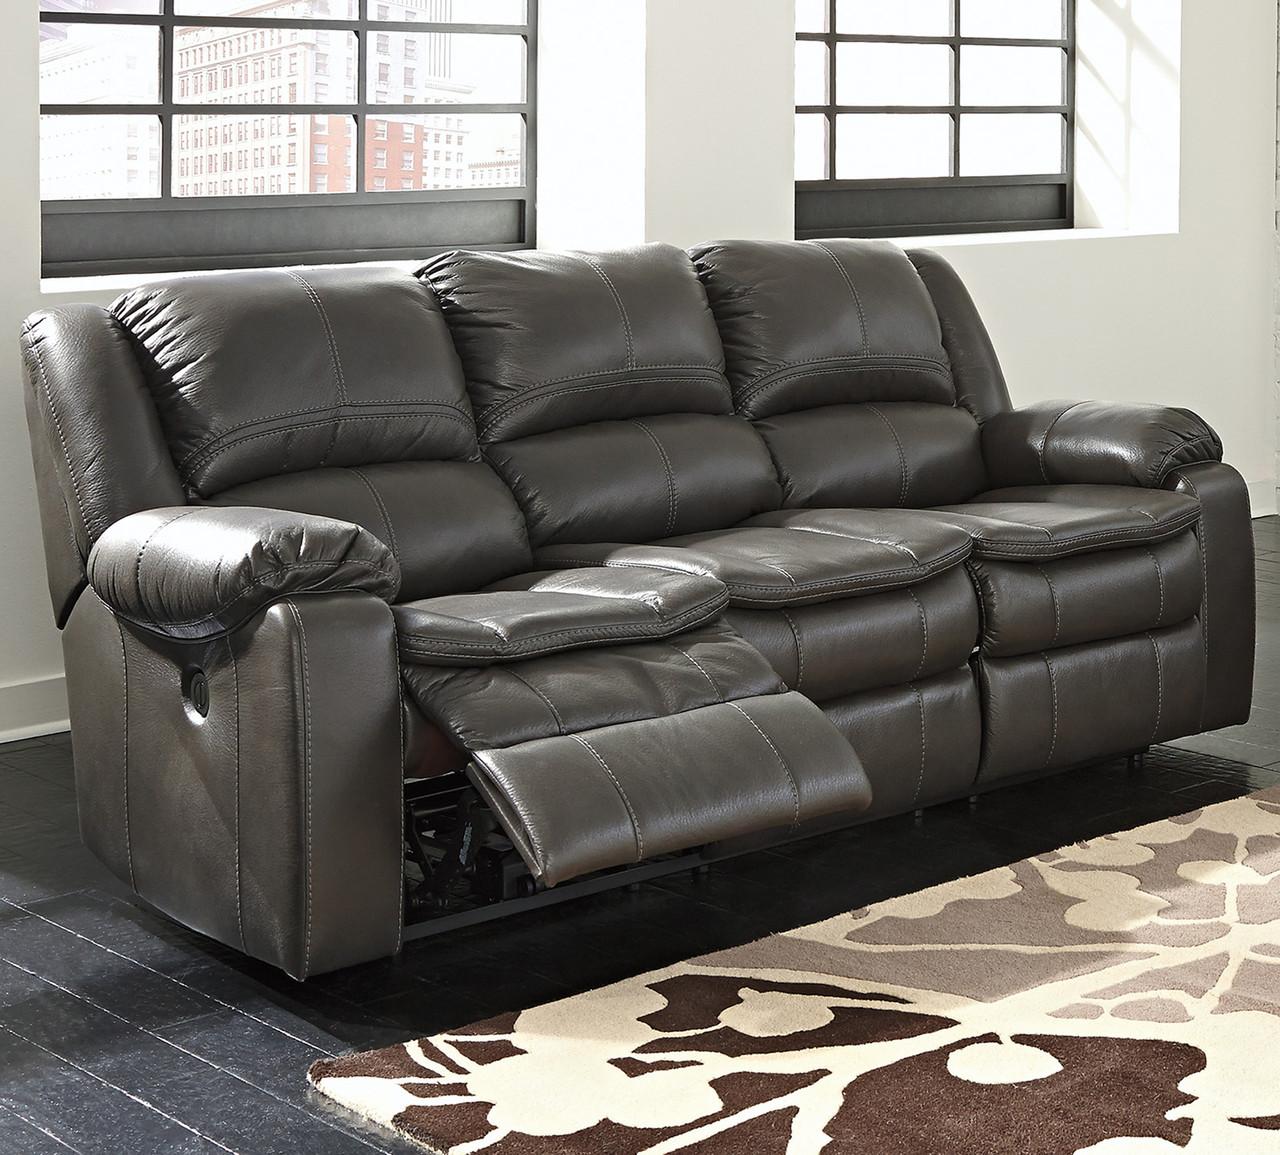 Wexford Grey Leather Reclining Sofa